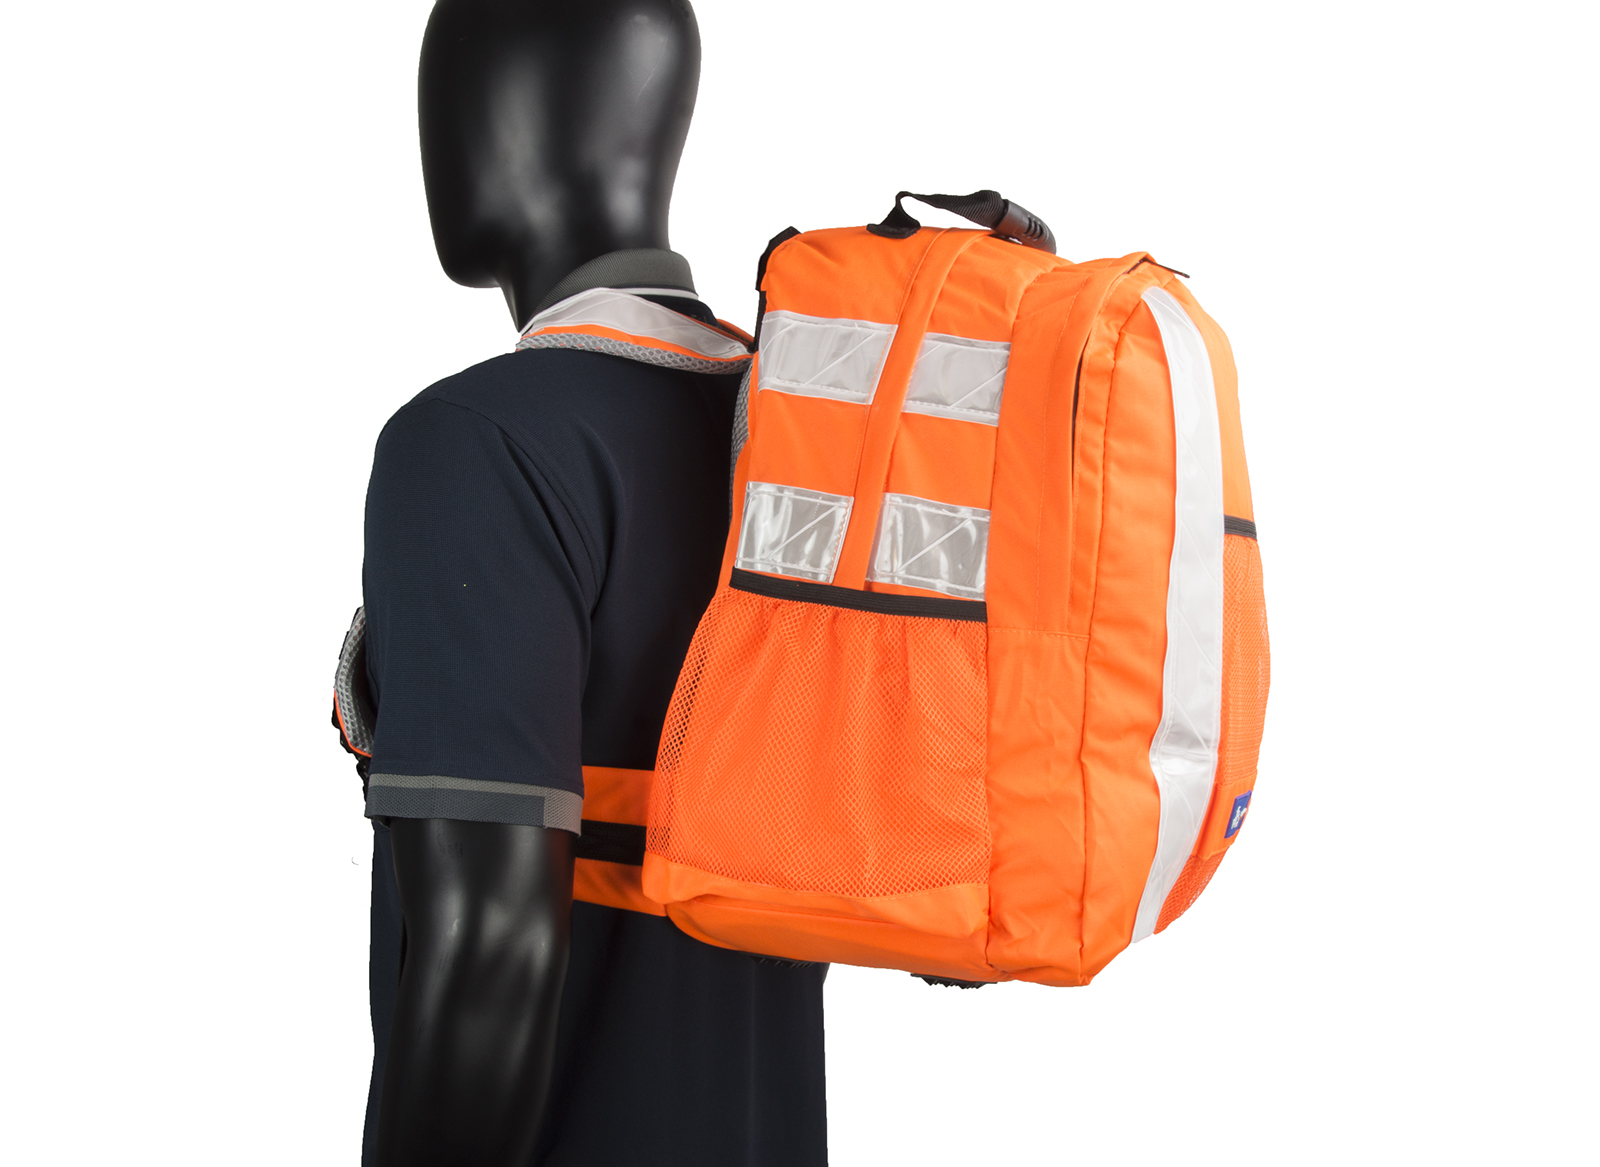 High Vis Backpack Work Rucksack w/ Anti-Entanglement System & Reflective Stripes -4